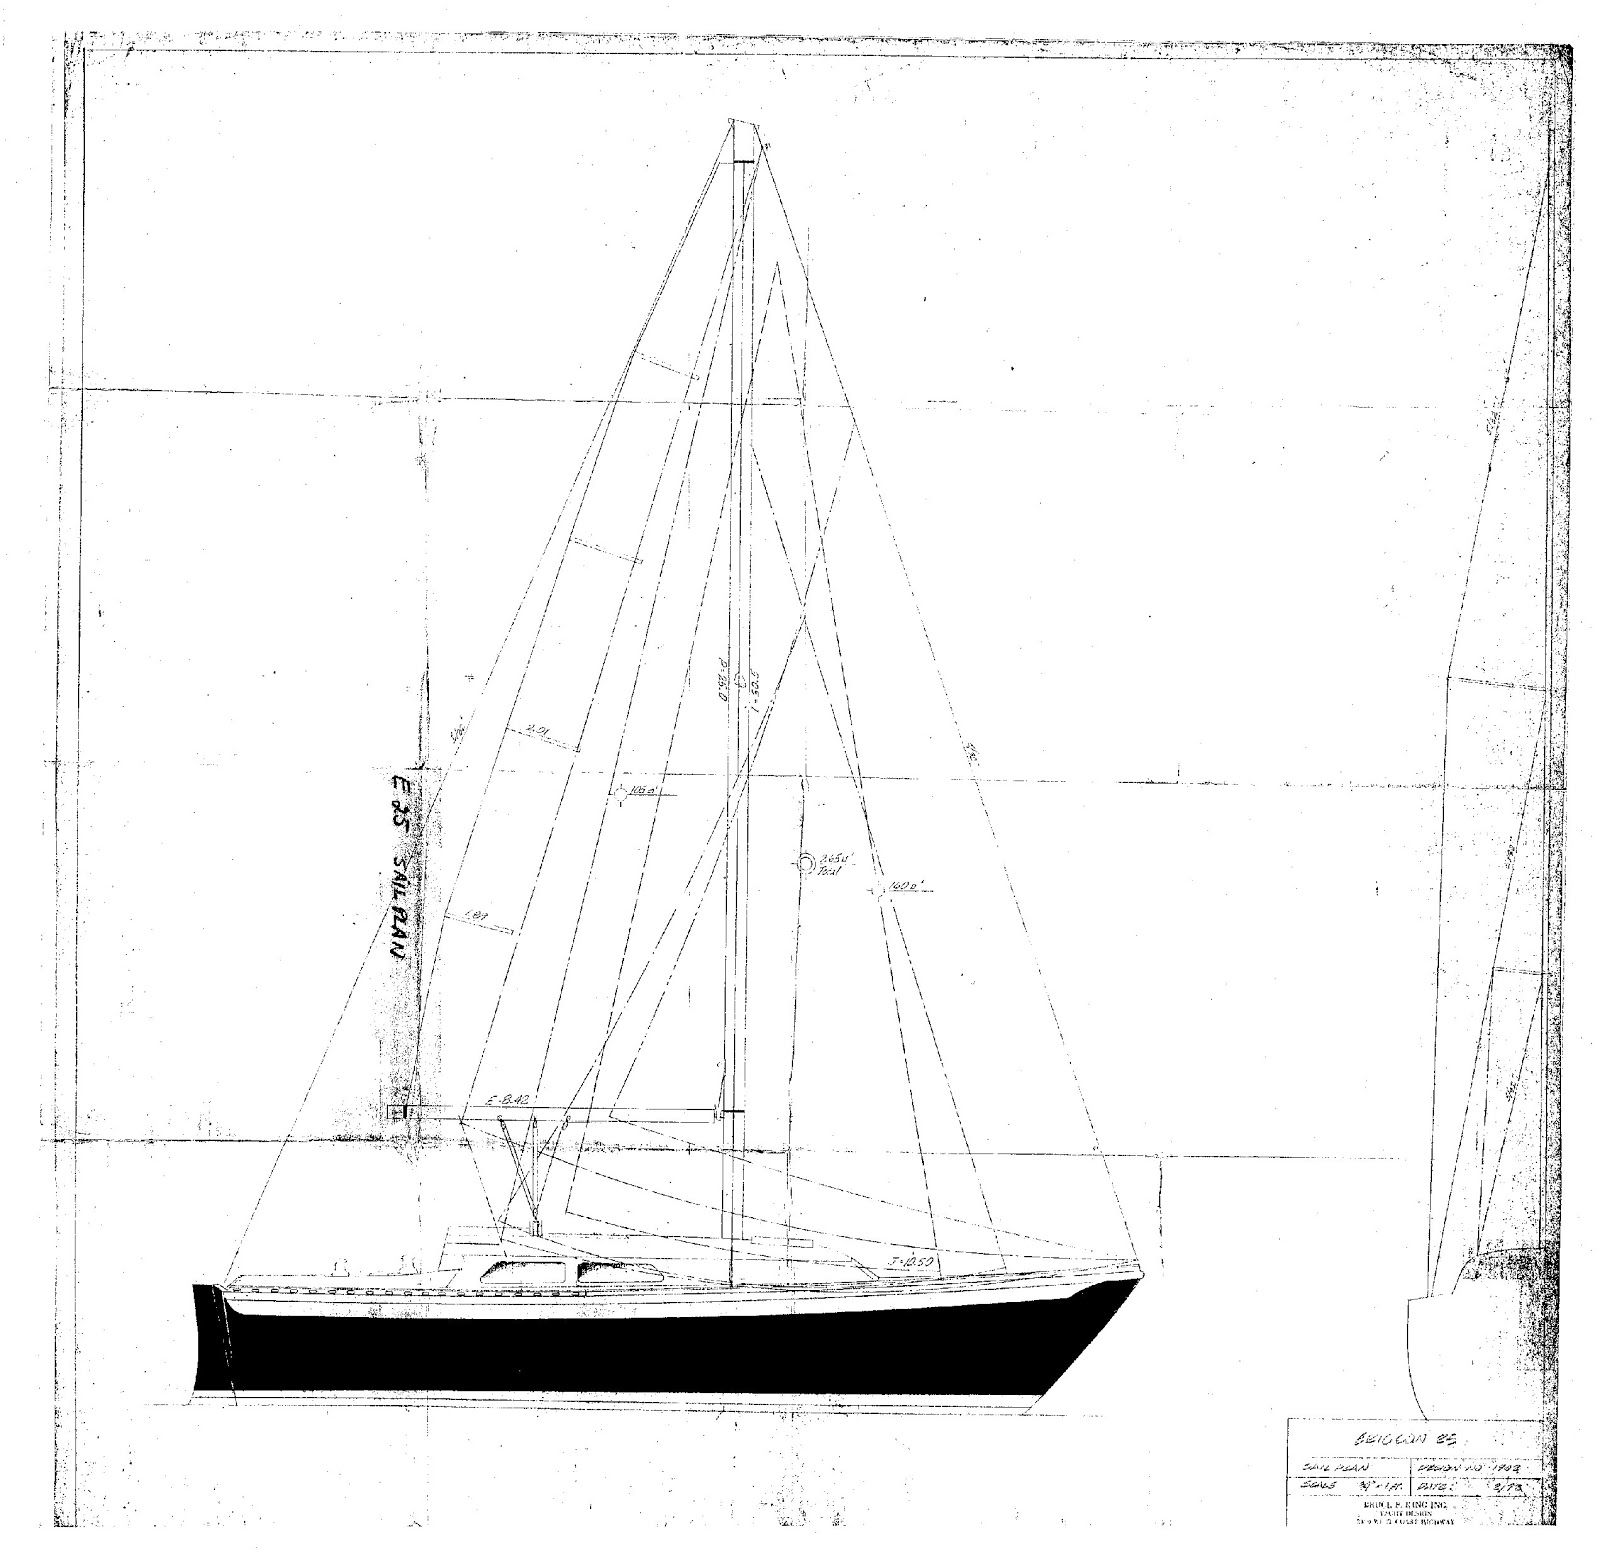 boat navigation lights wiring diagram autometer temp gauge catalina 25 get free image about